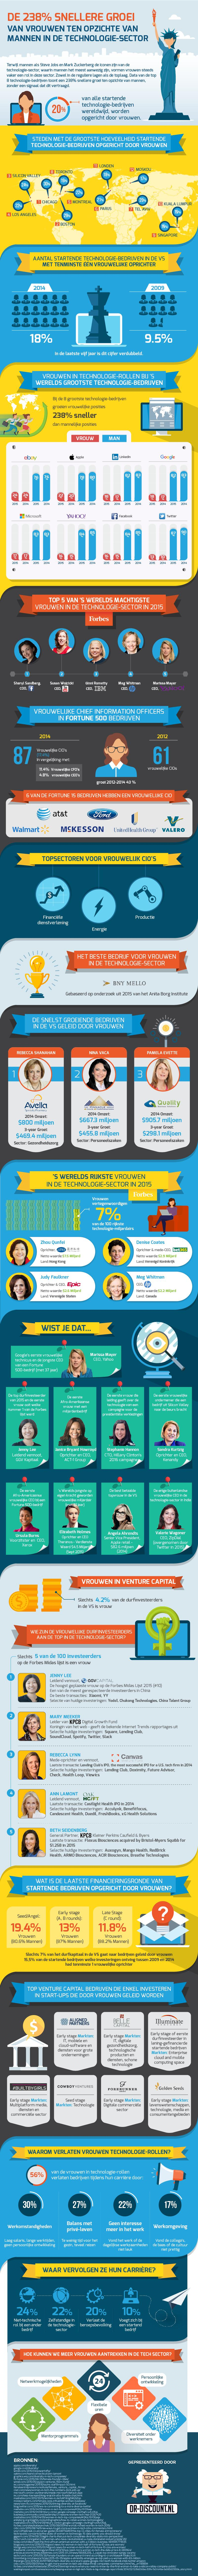 succesvolle vrouwen in  tech industrie